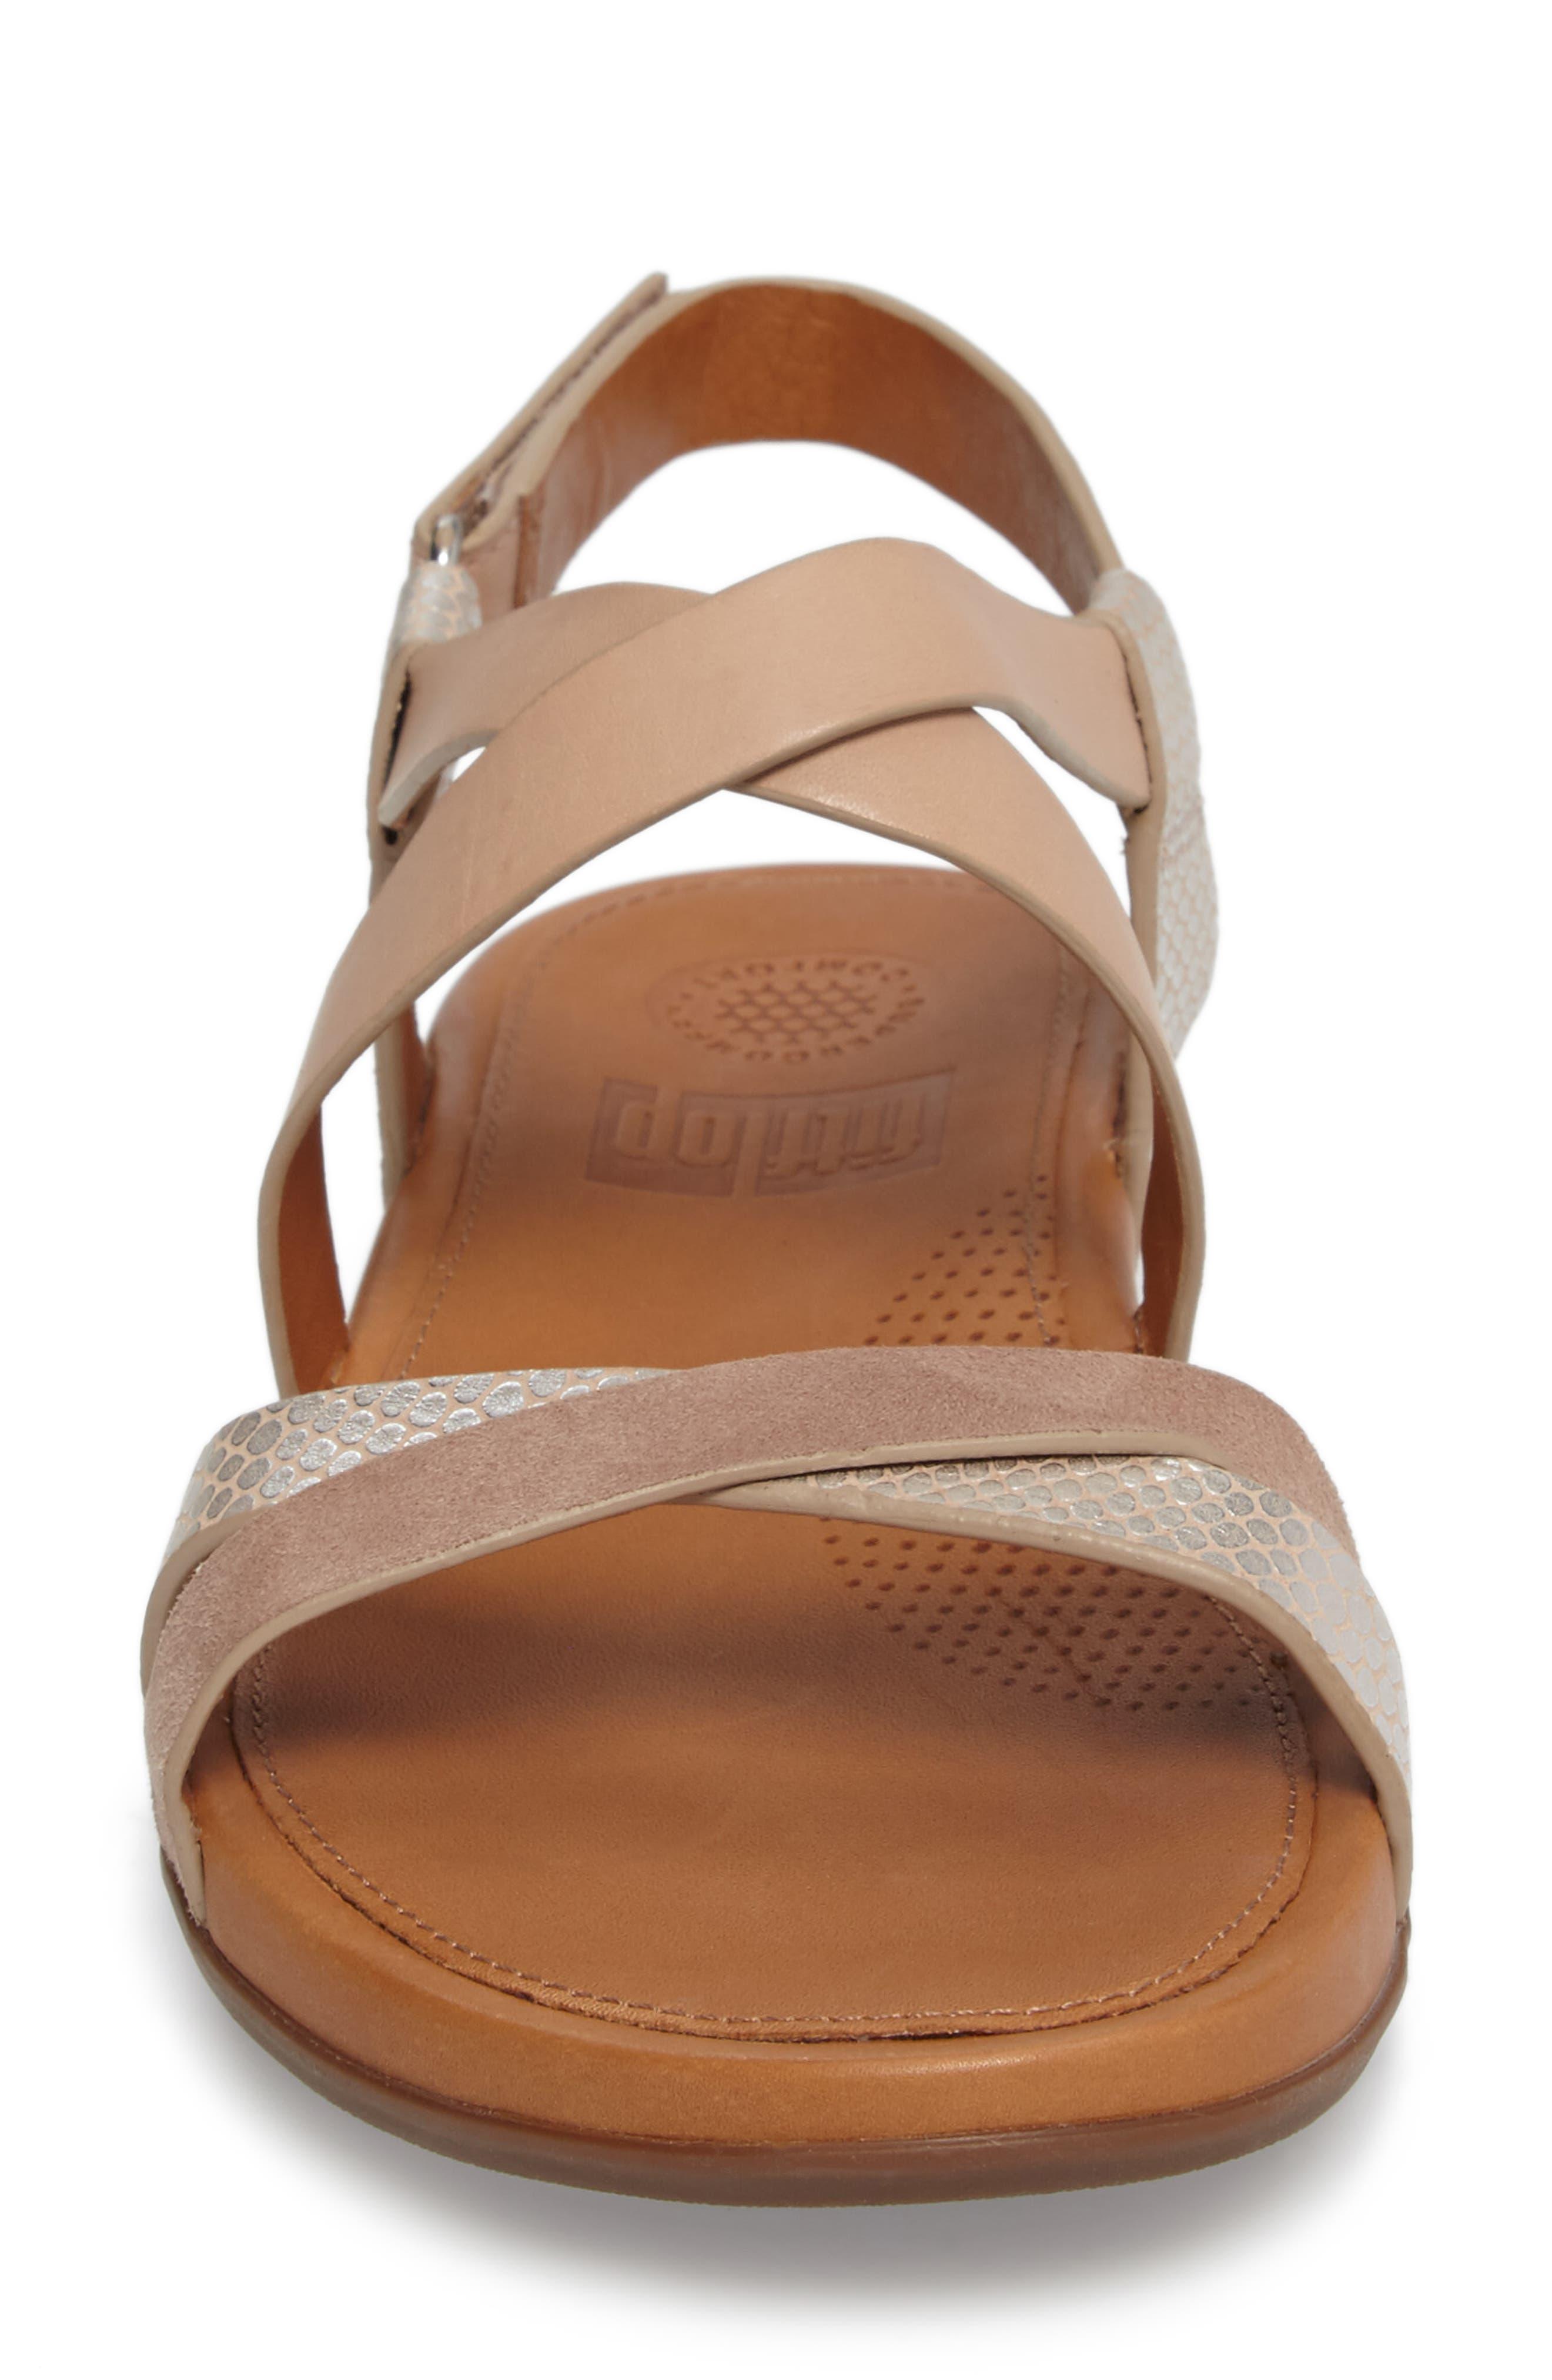 Lumy Crisscross Sandal,                             Alternate thumbnail 4, color,                             290